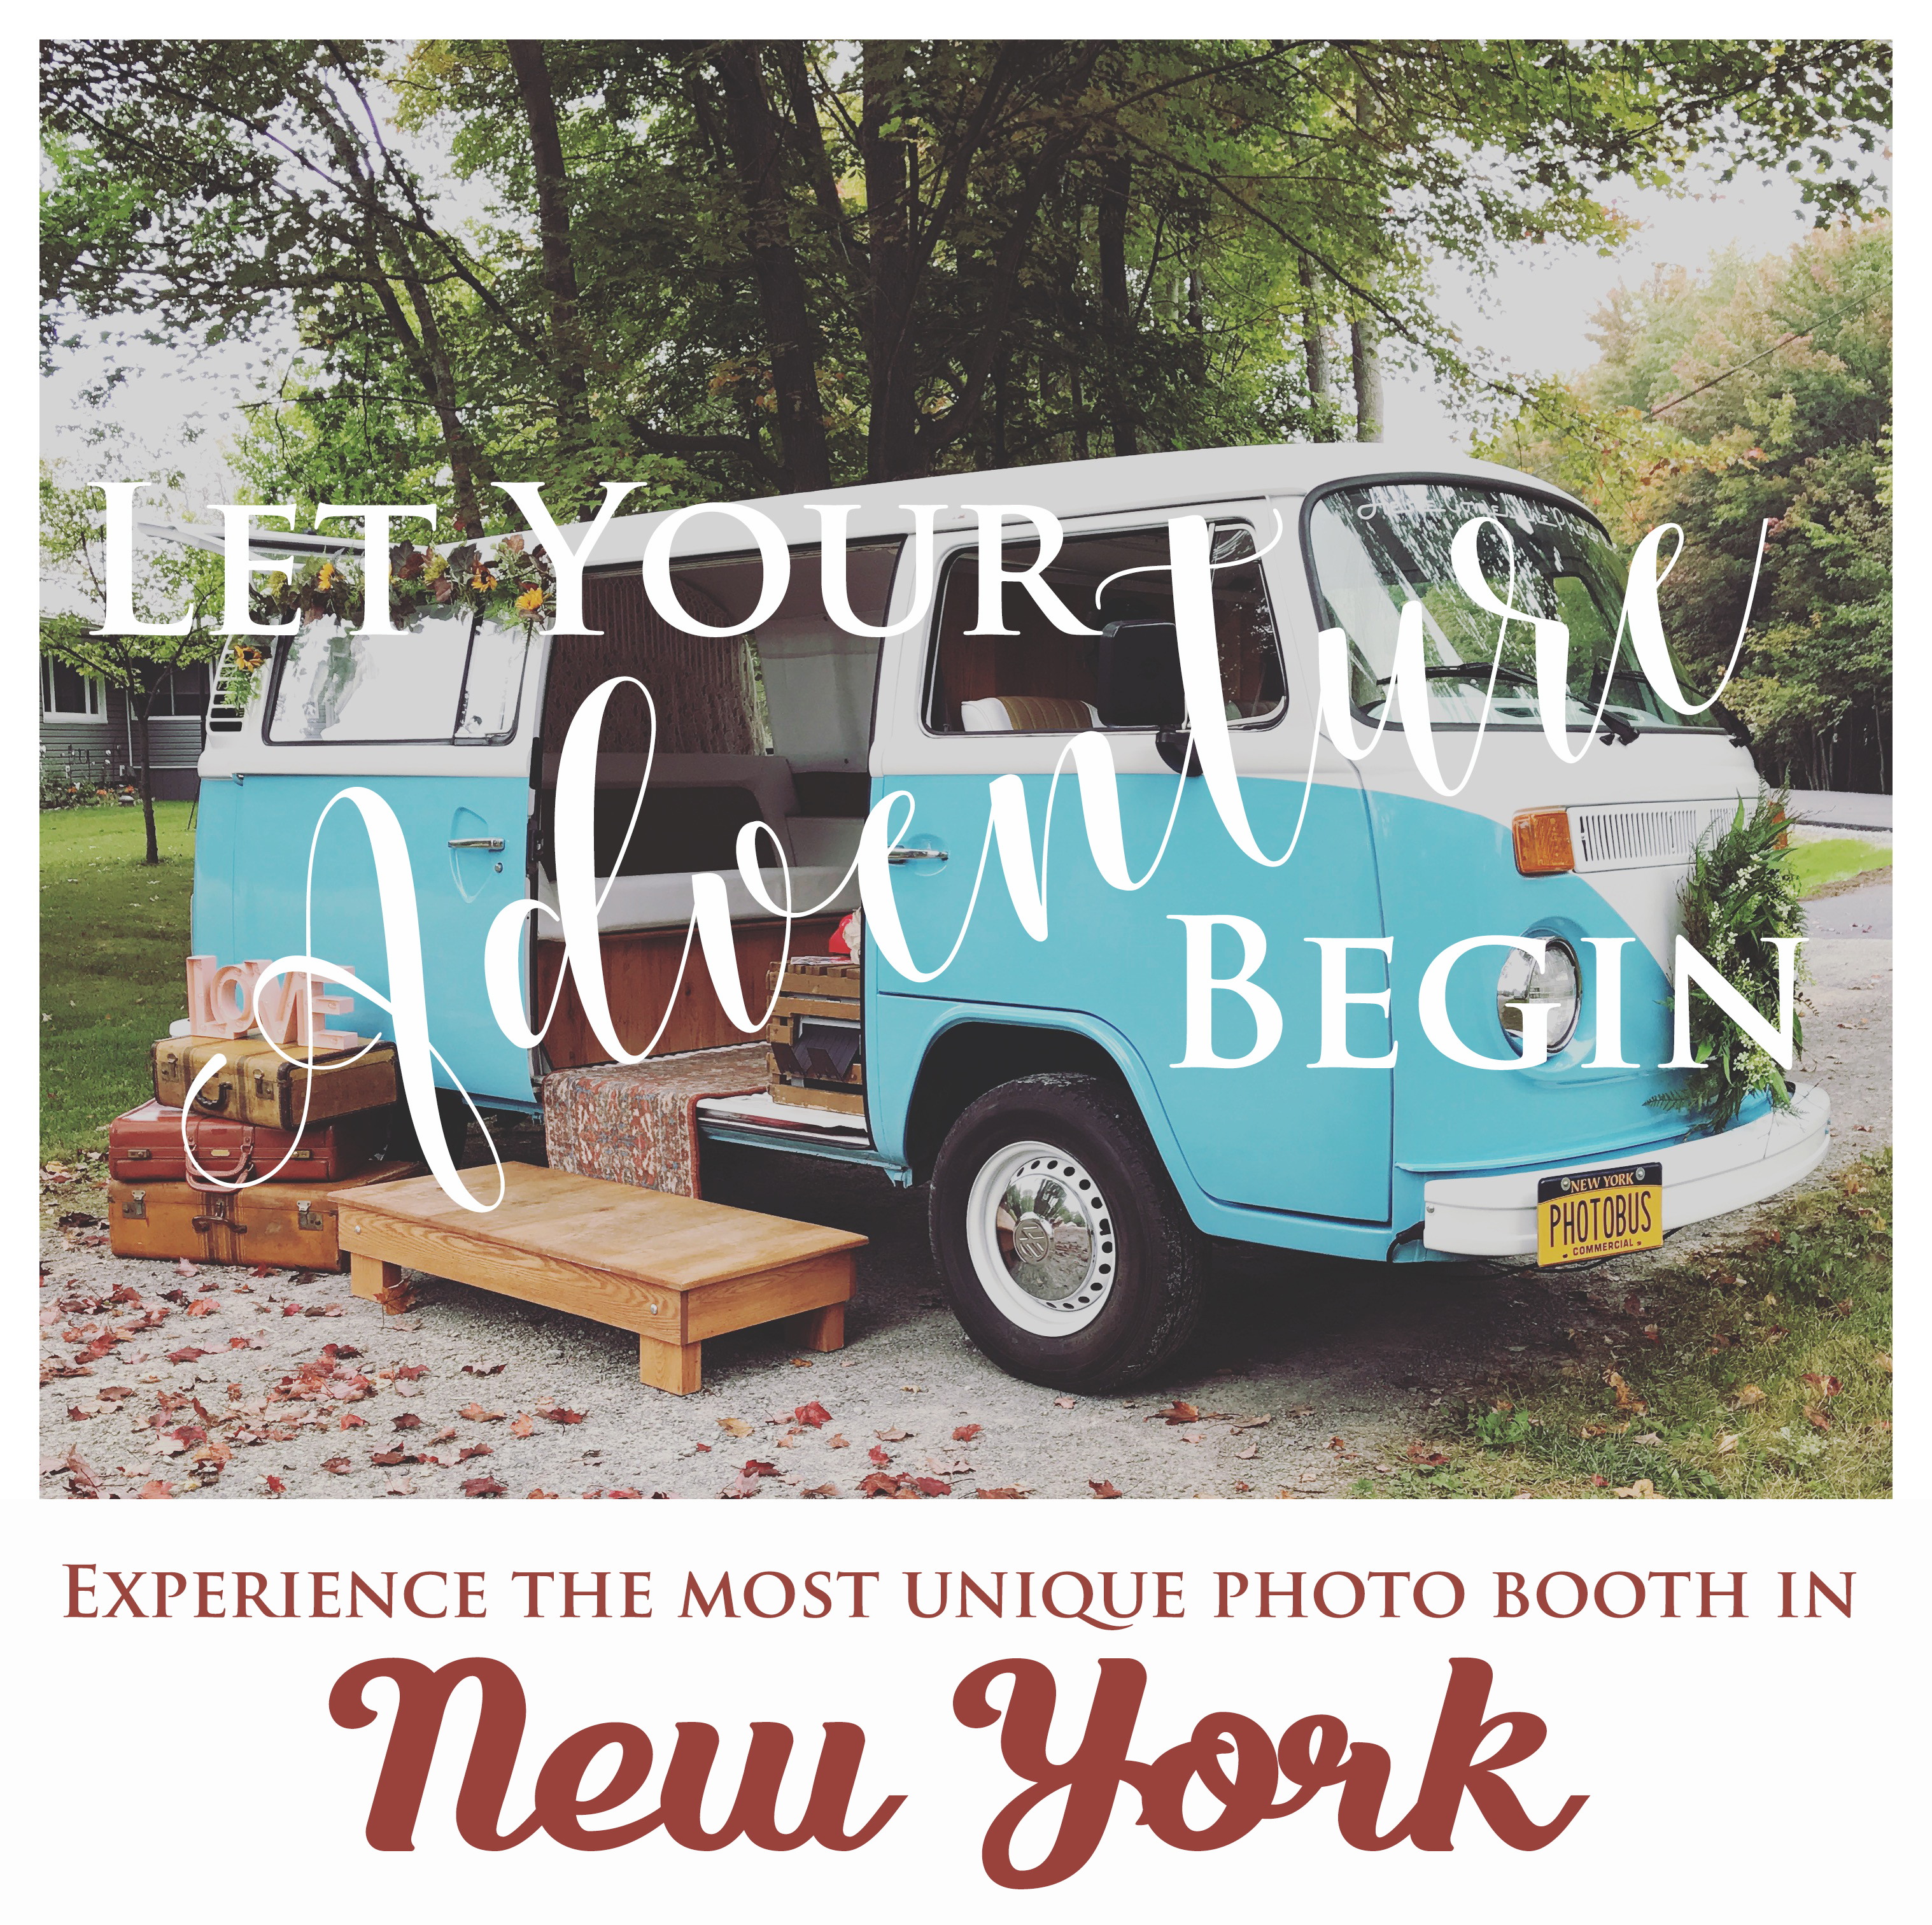 New York's Vintage 1977 VW Photo Bus